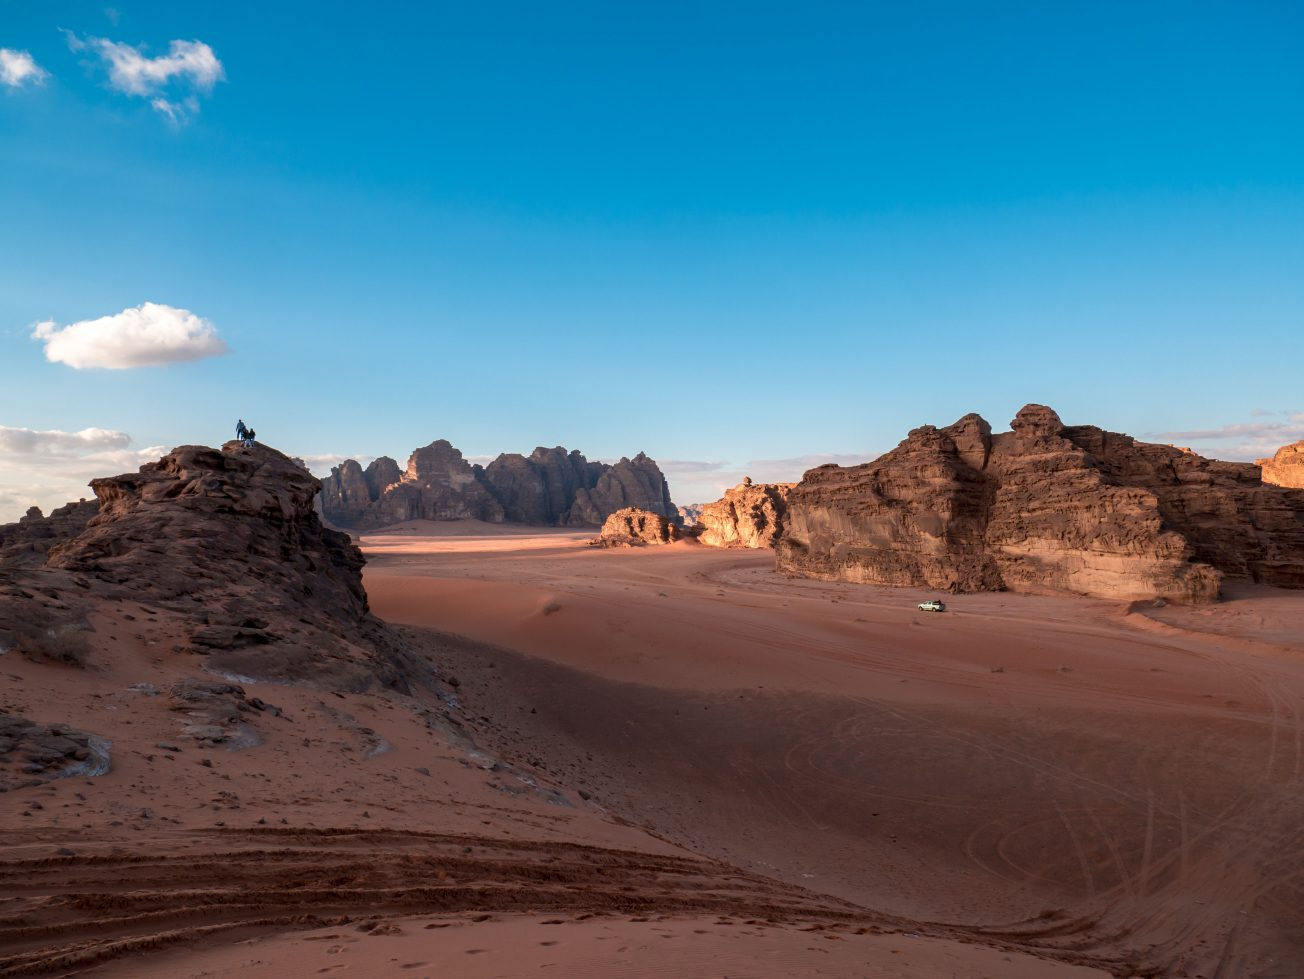 Jordánska krajina